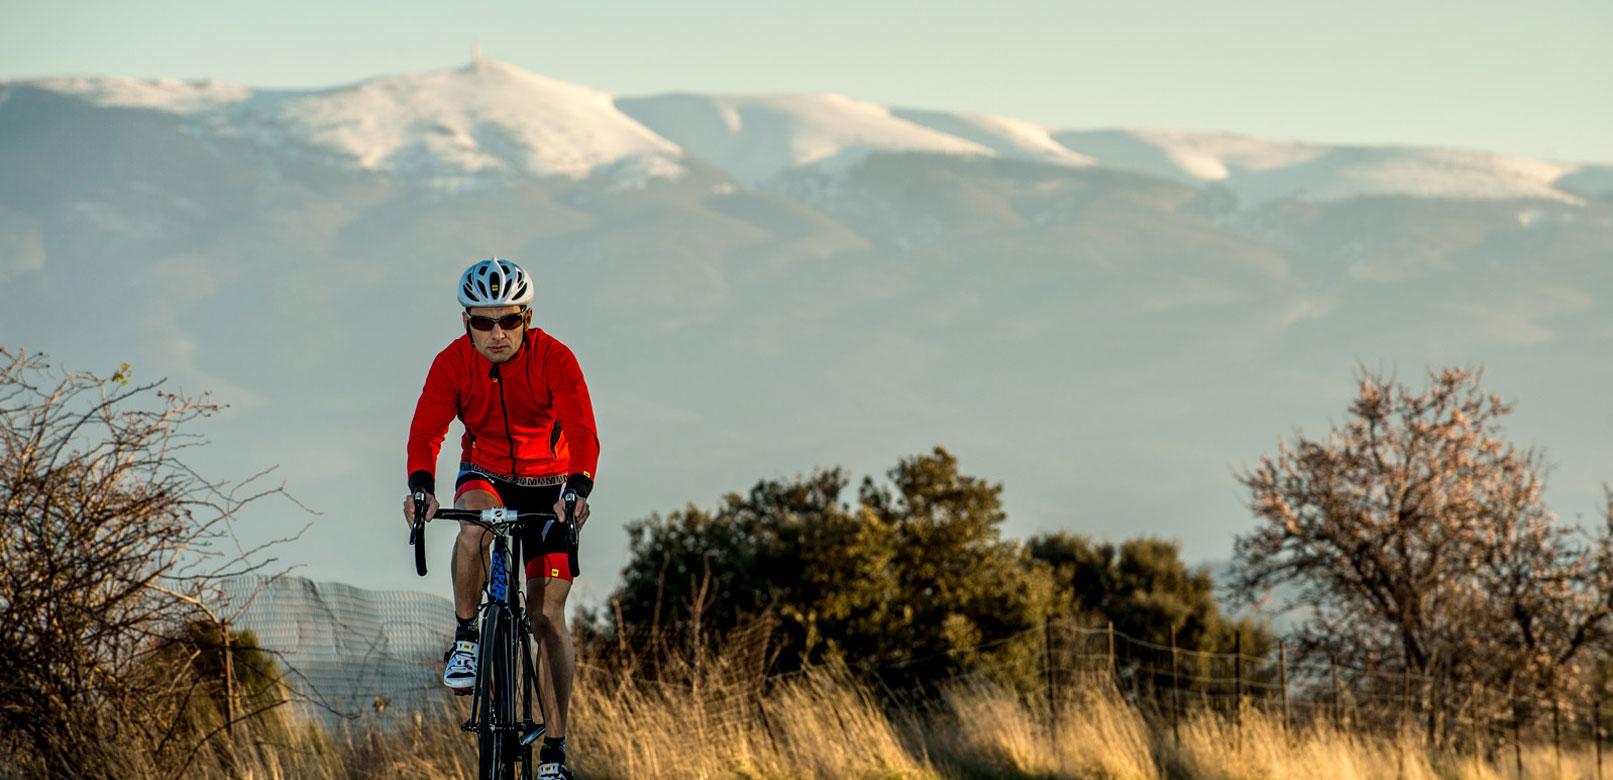 Cycliste au pied du Ventoux © Rosso